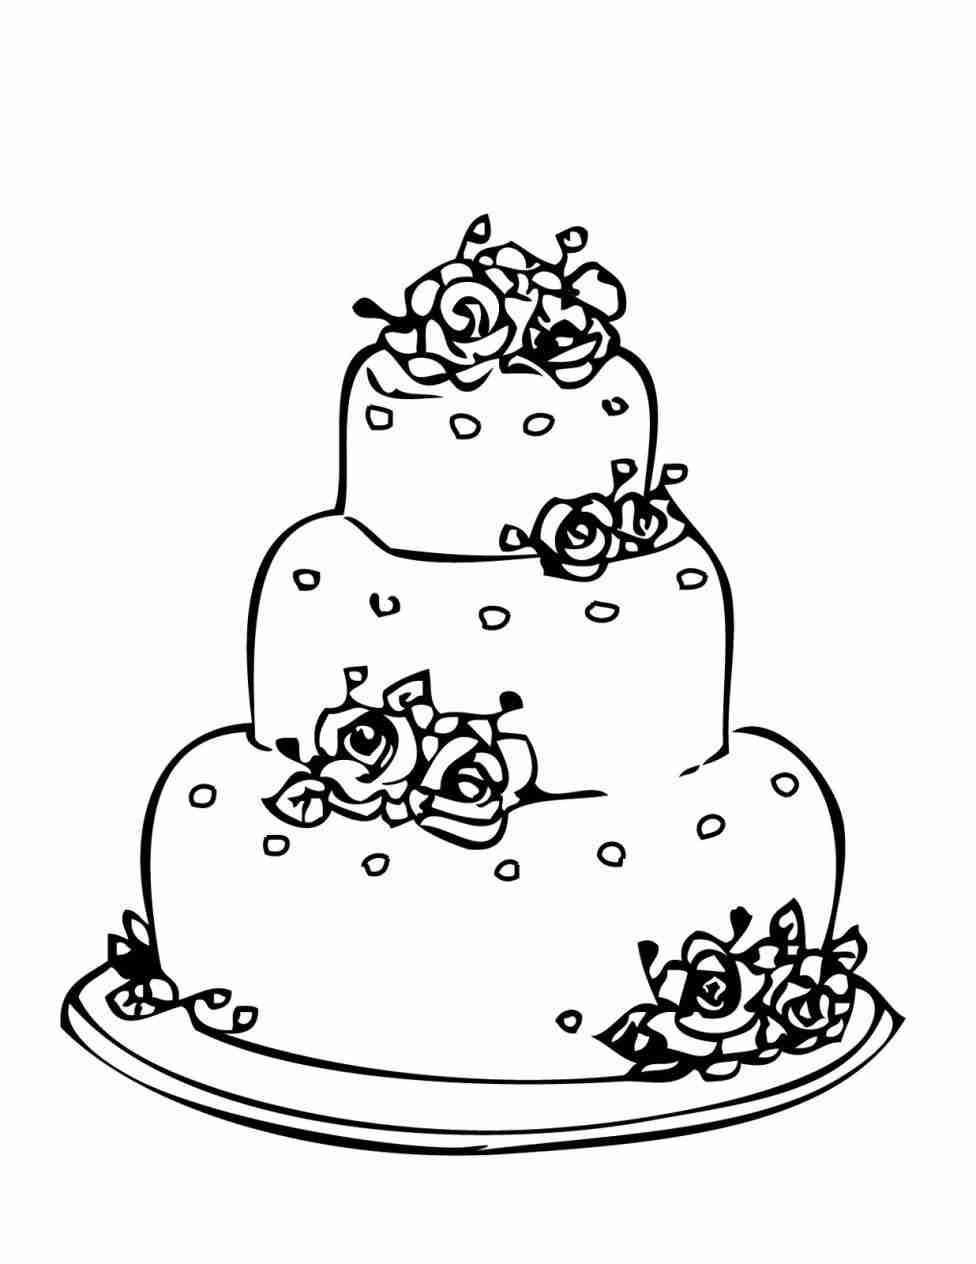 vintage wedding cake drawing Wedding coloring pages